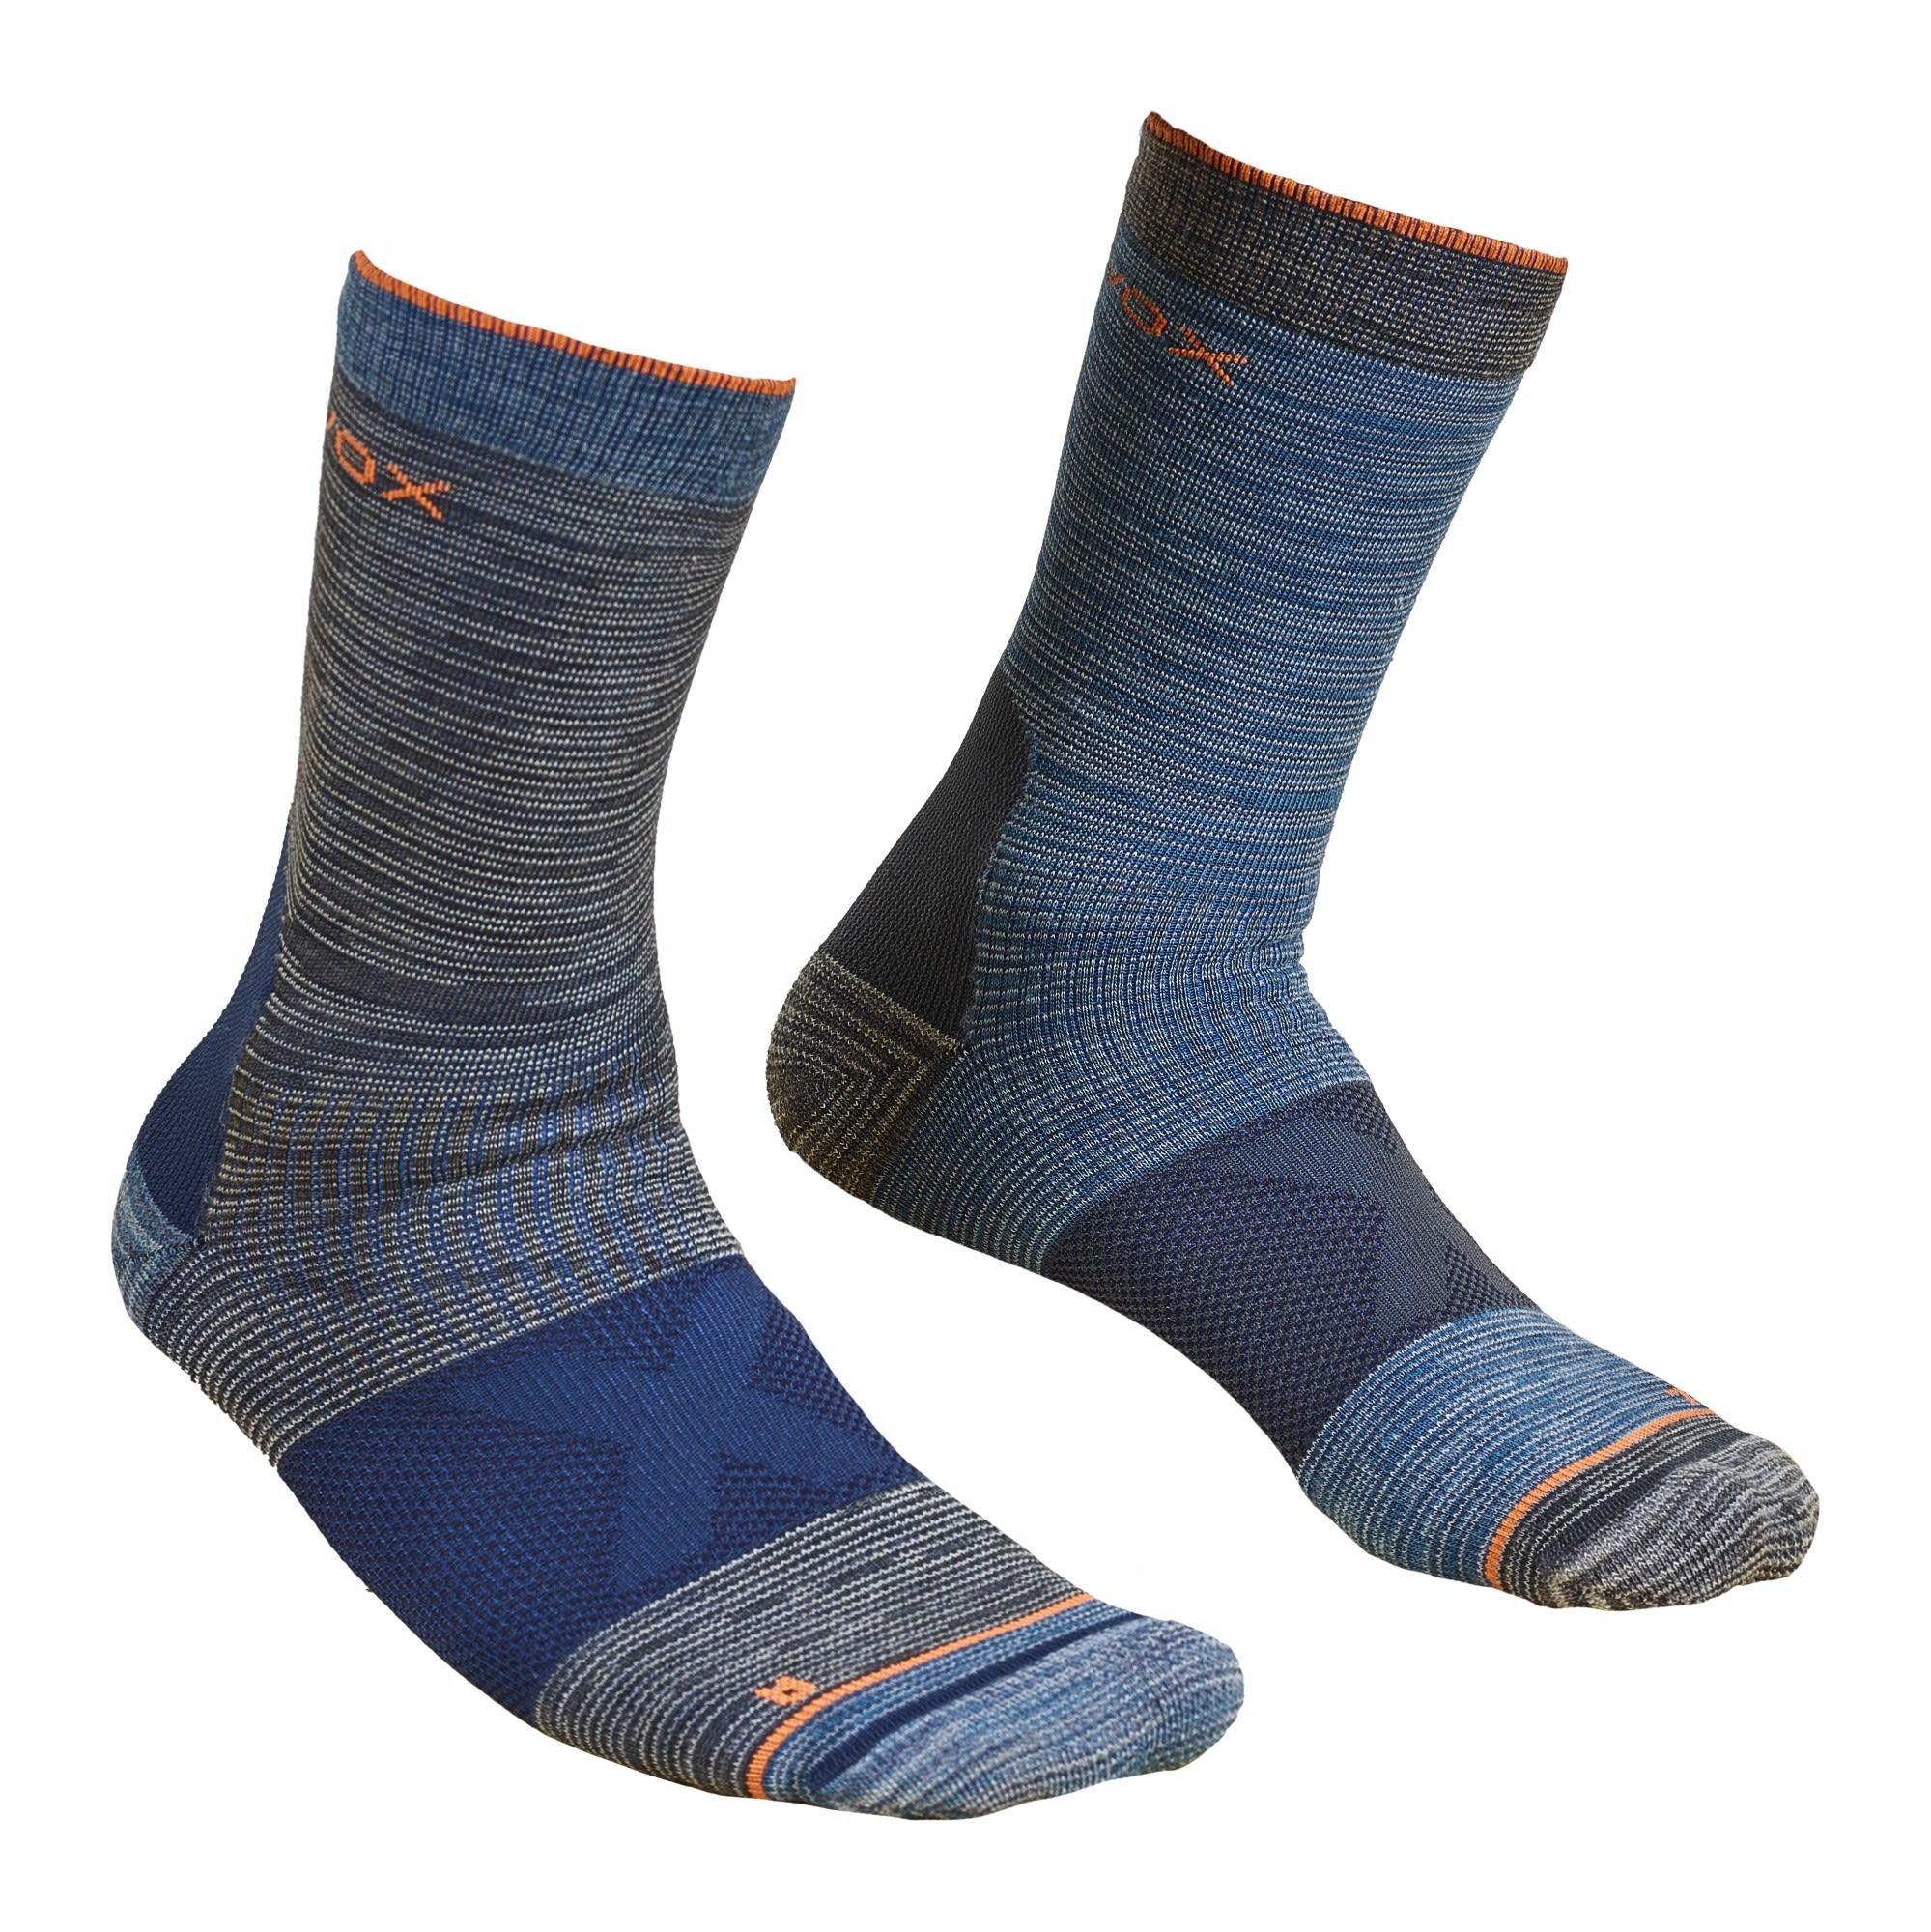 Ortovox Merino Socks Alpinist Mid Grau, Male Merino Socken, 45 -47